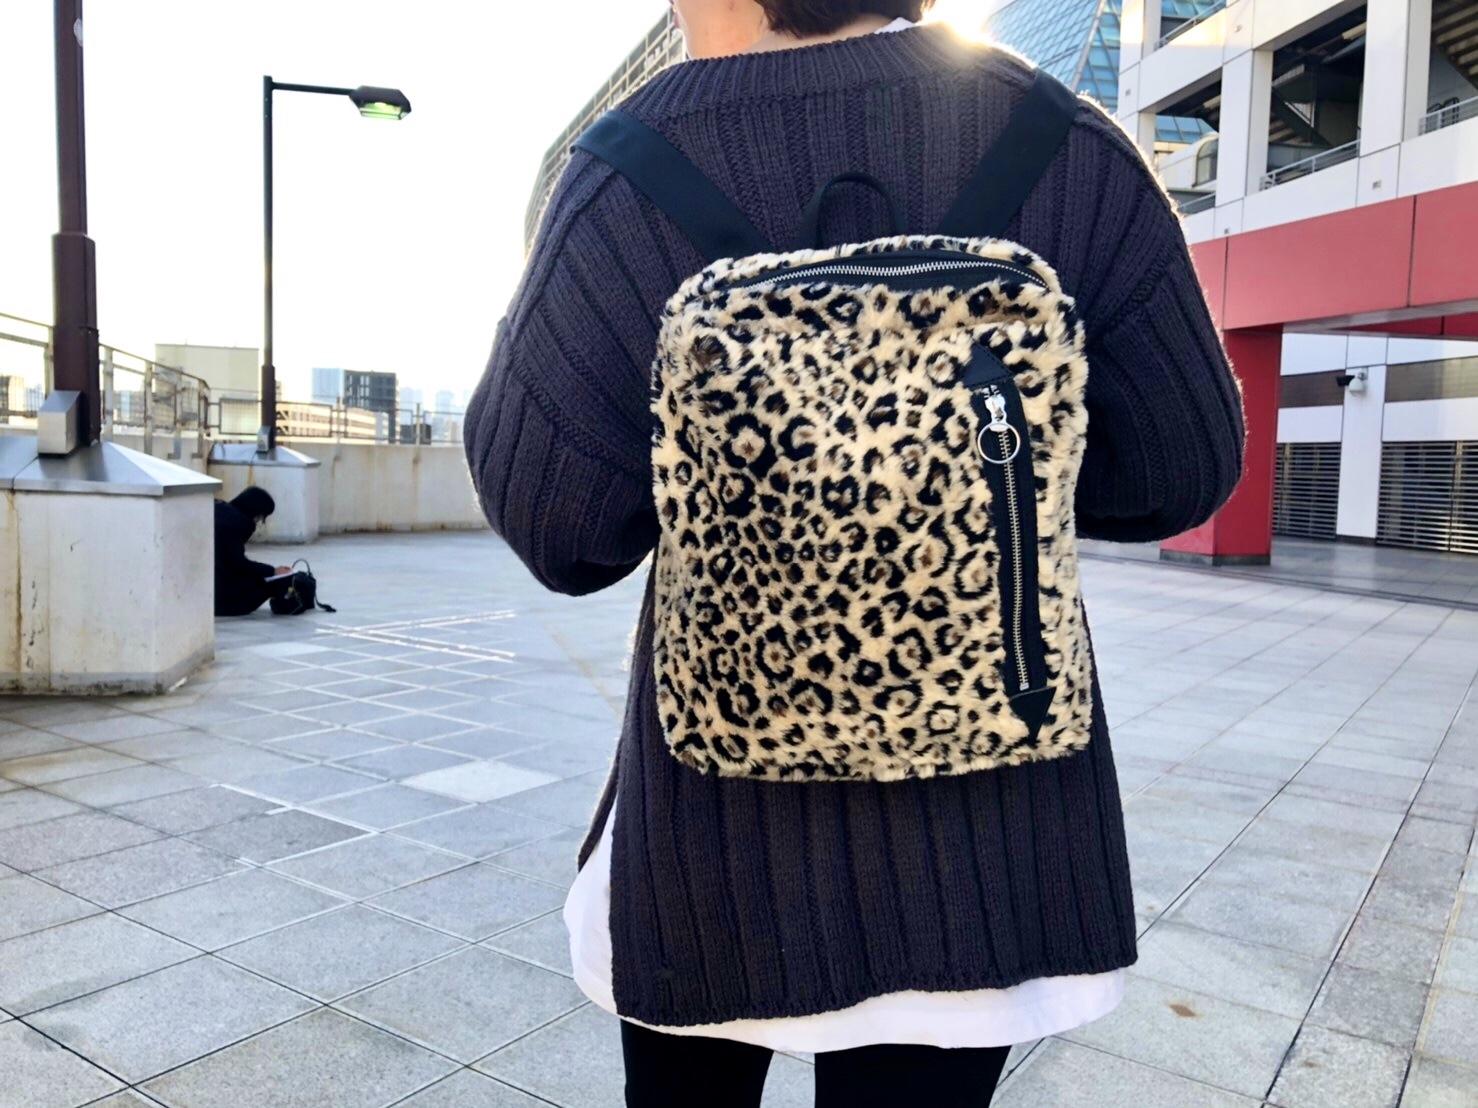 POMTATA ポンタタ ScrapBook スクラップブック リュック レオパード leopard エコファー 東武池袋 池袋東武 東武百貨店